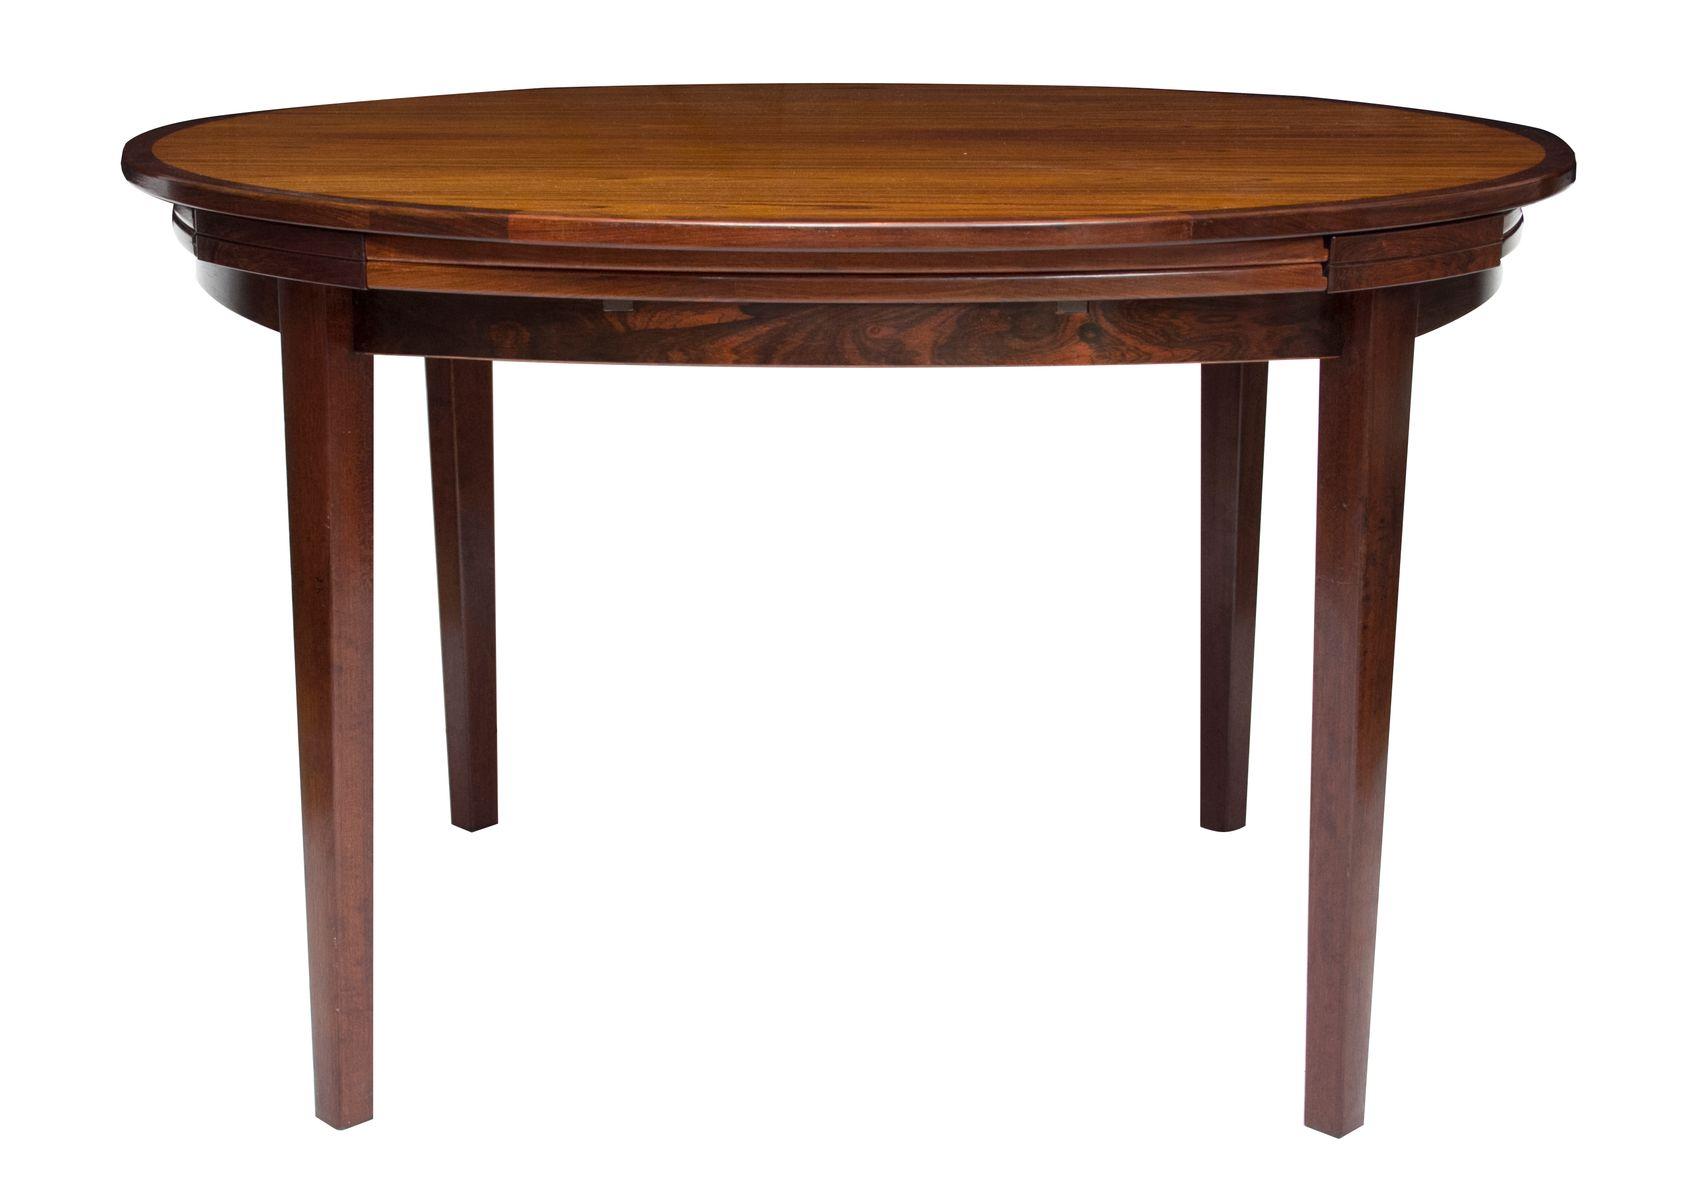 Mid Century Extendable Rosewood Dining Table from Dyrlund  : mid century extendable rosewood dining table from dyrlund 1960s 2 from www.pamono.com size 1701 x 1200 jpeg 72kB